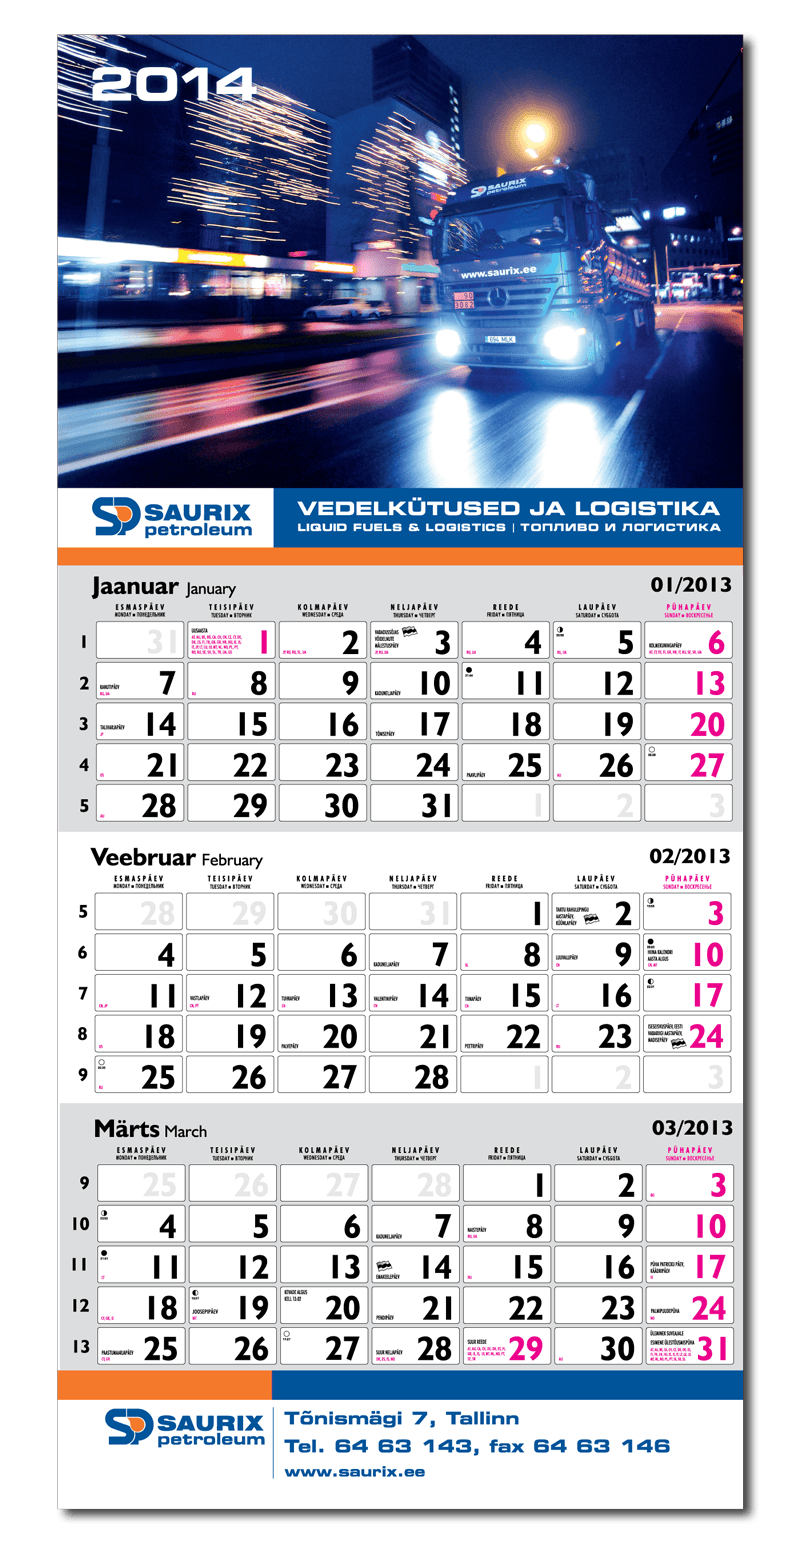 Saurix kalender 2014 big